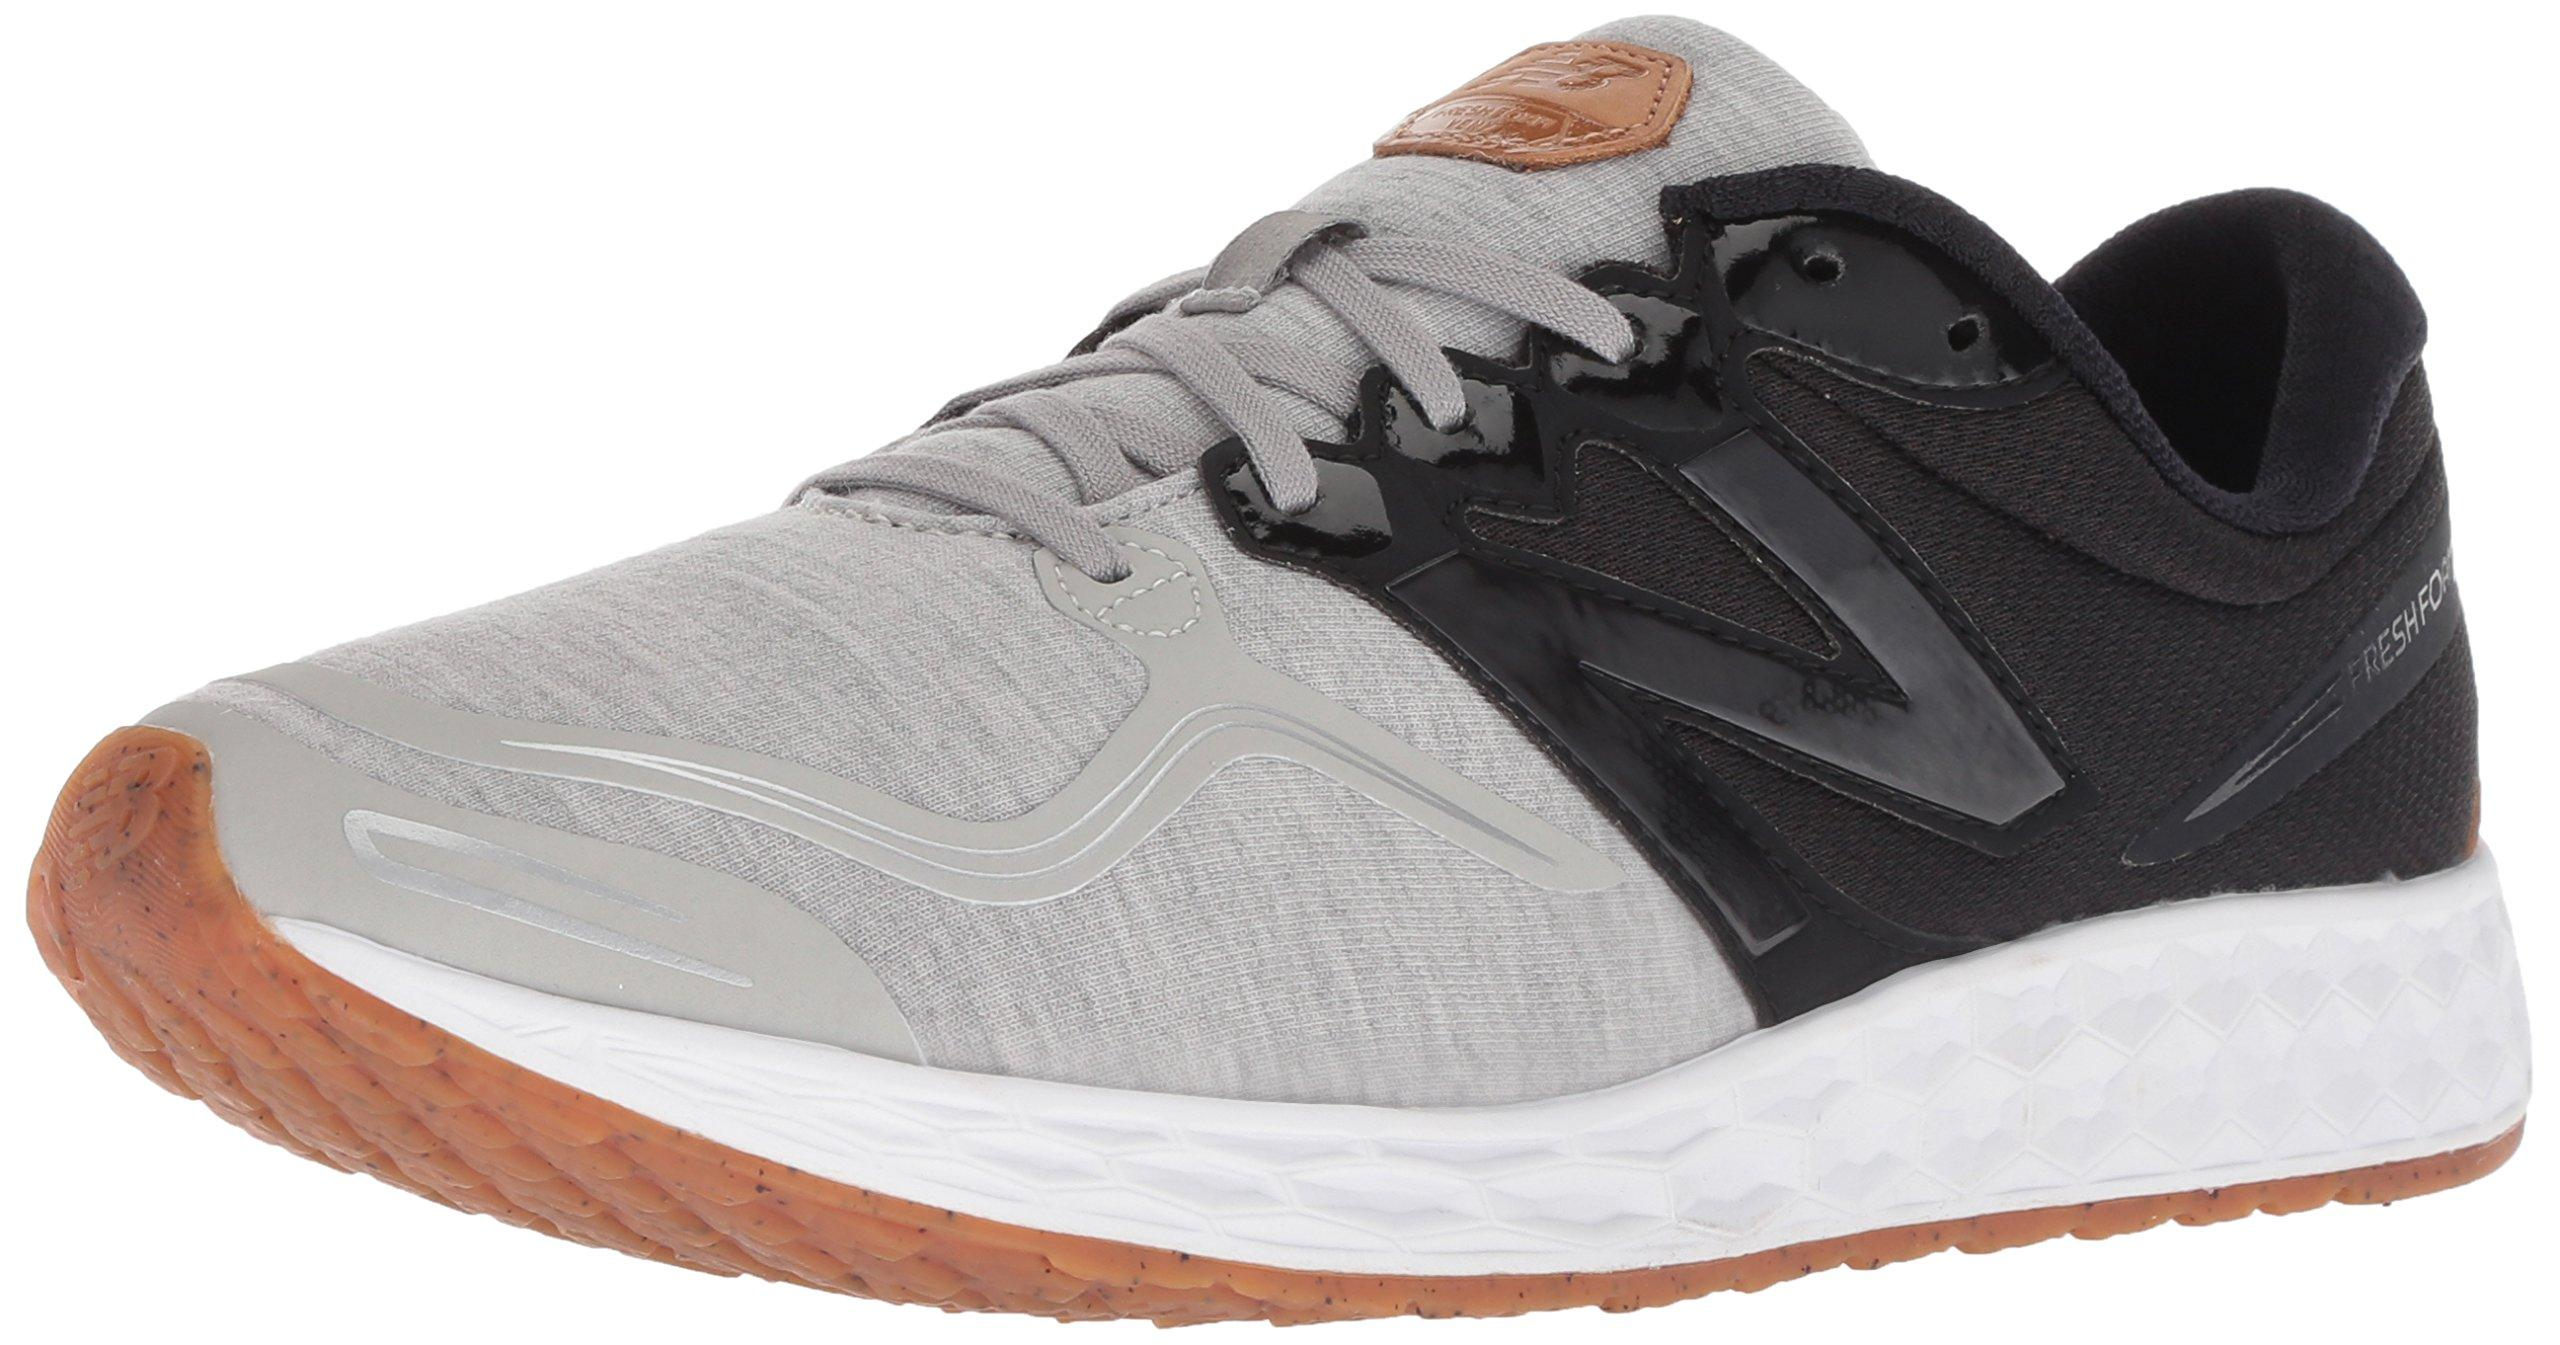 New Balance Synthetic Veniz V1 Fresh Foam Running Shoe in Silver ...